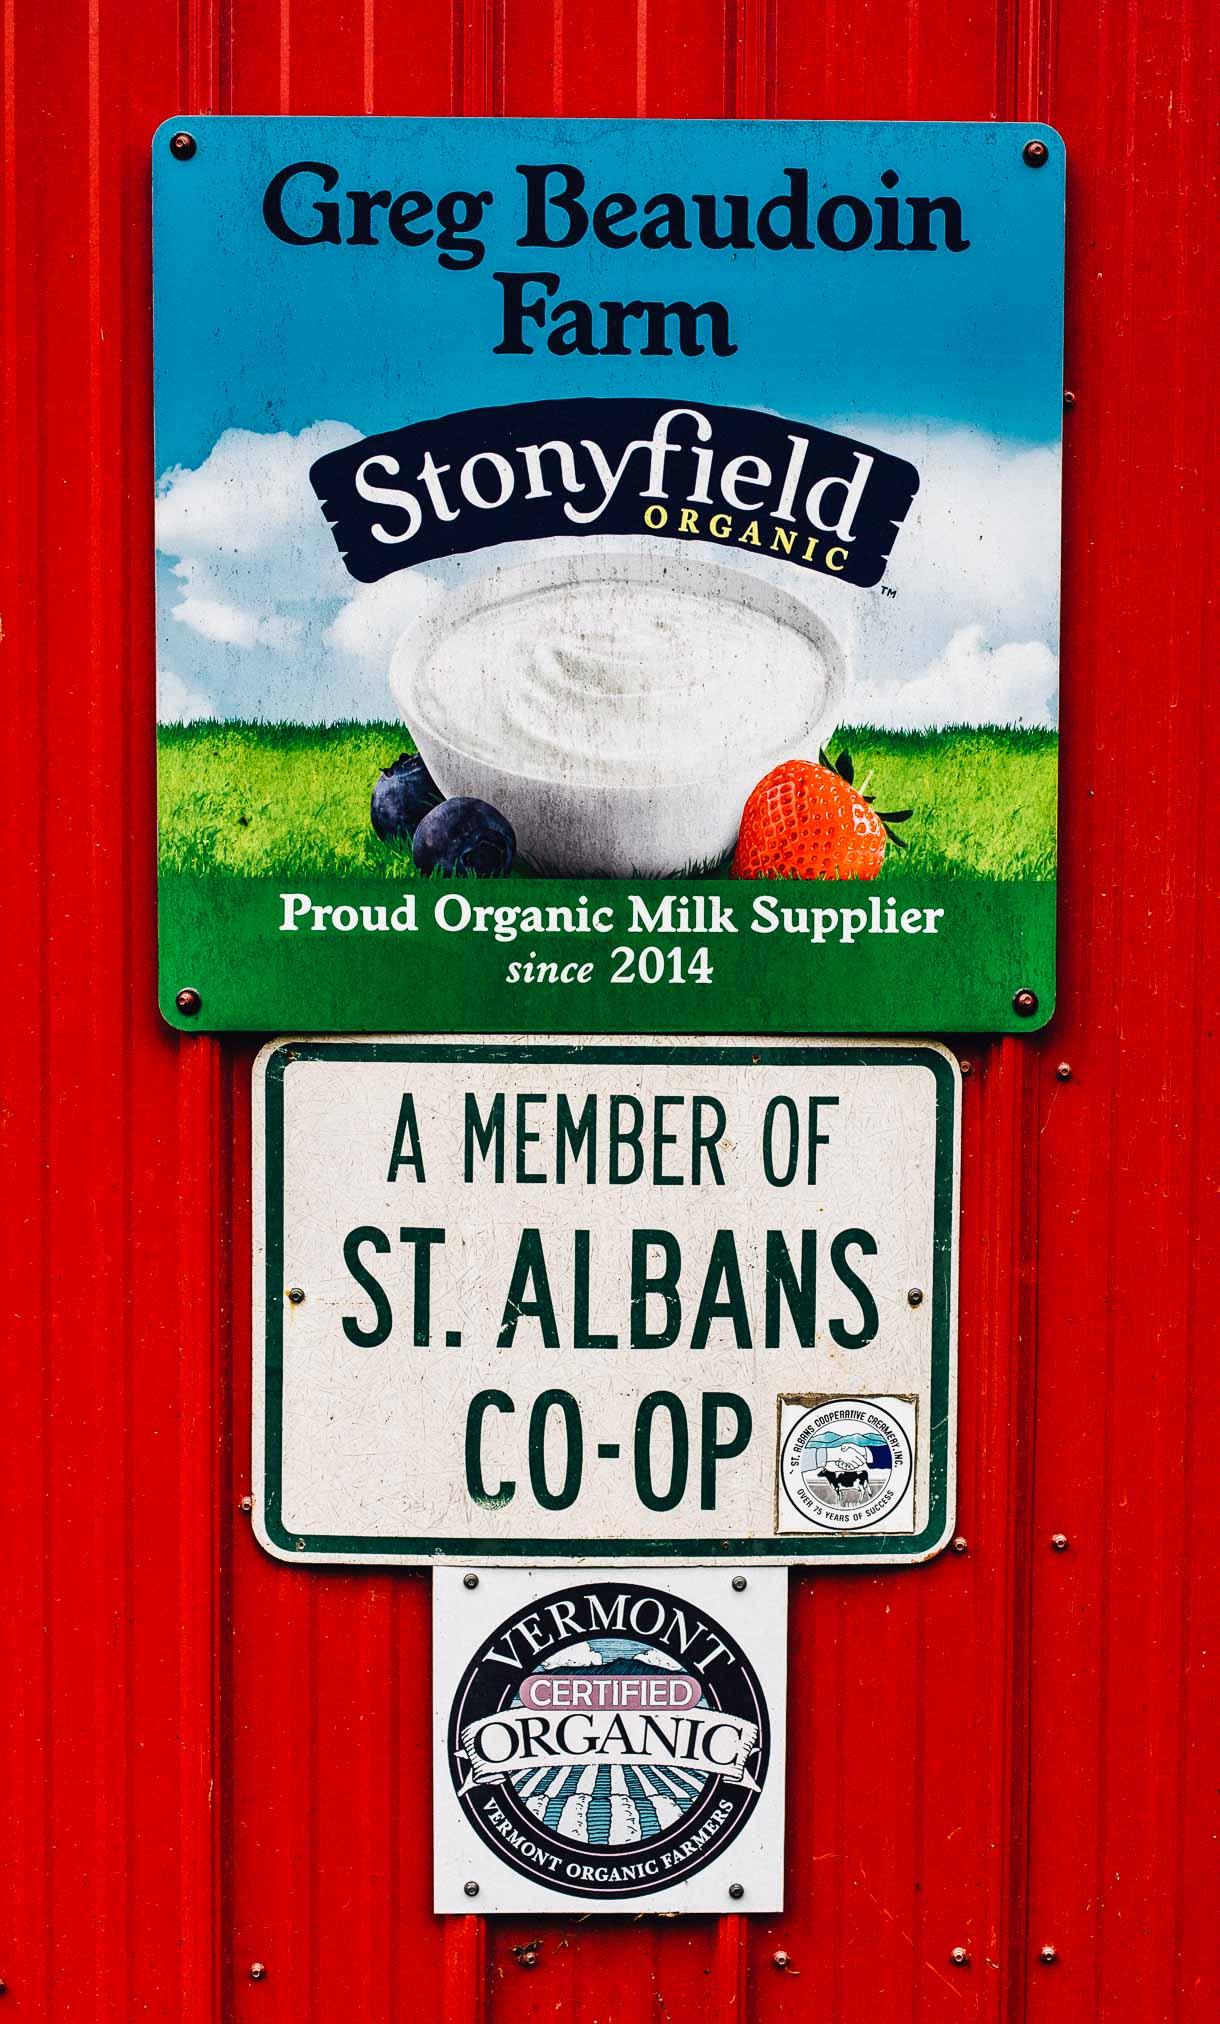 stonyfield organic farm